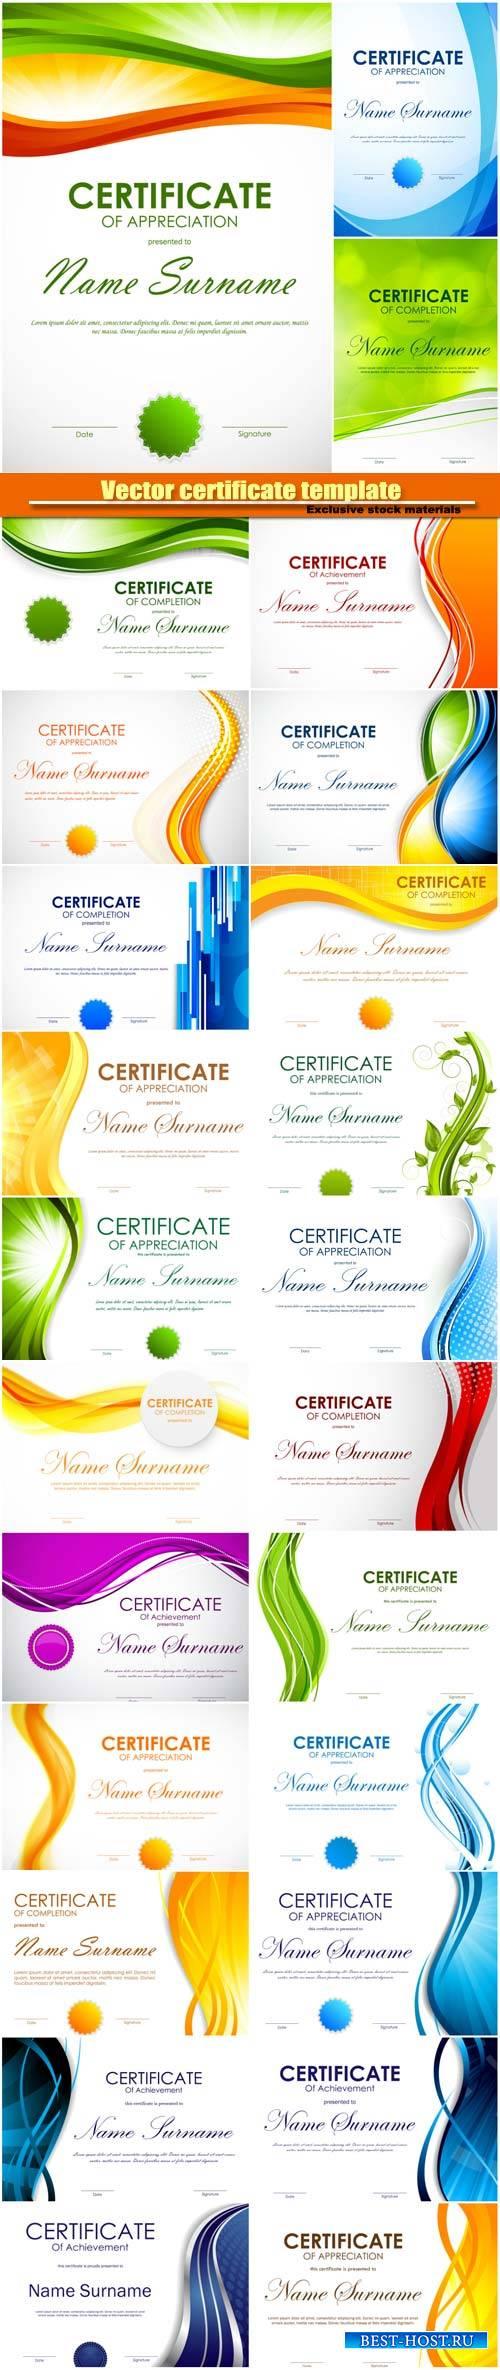 Vector certificate of appreciation template